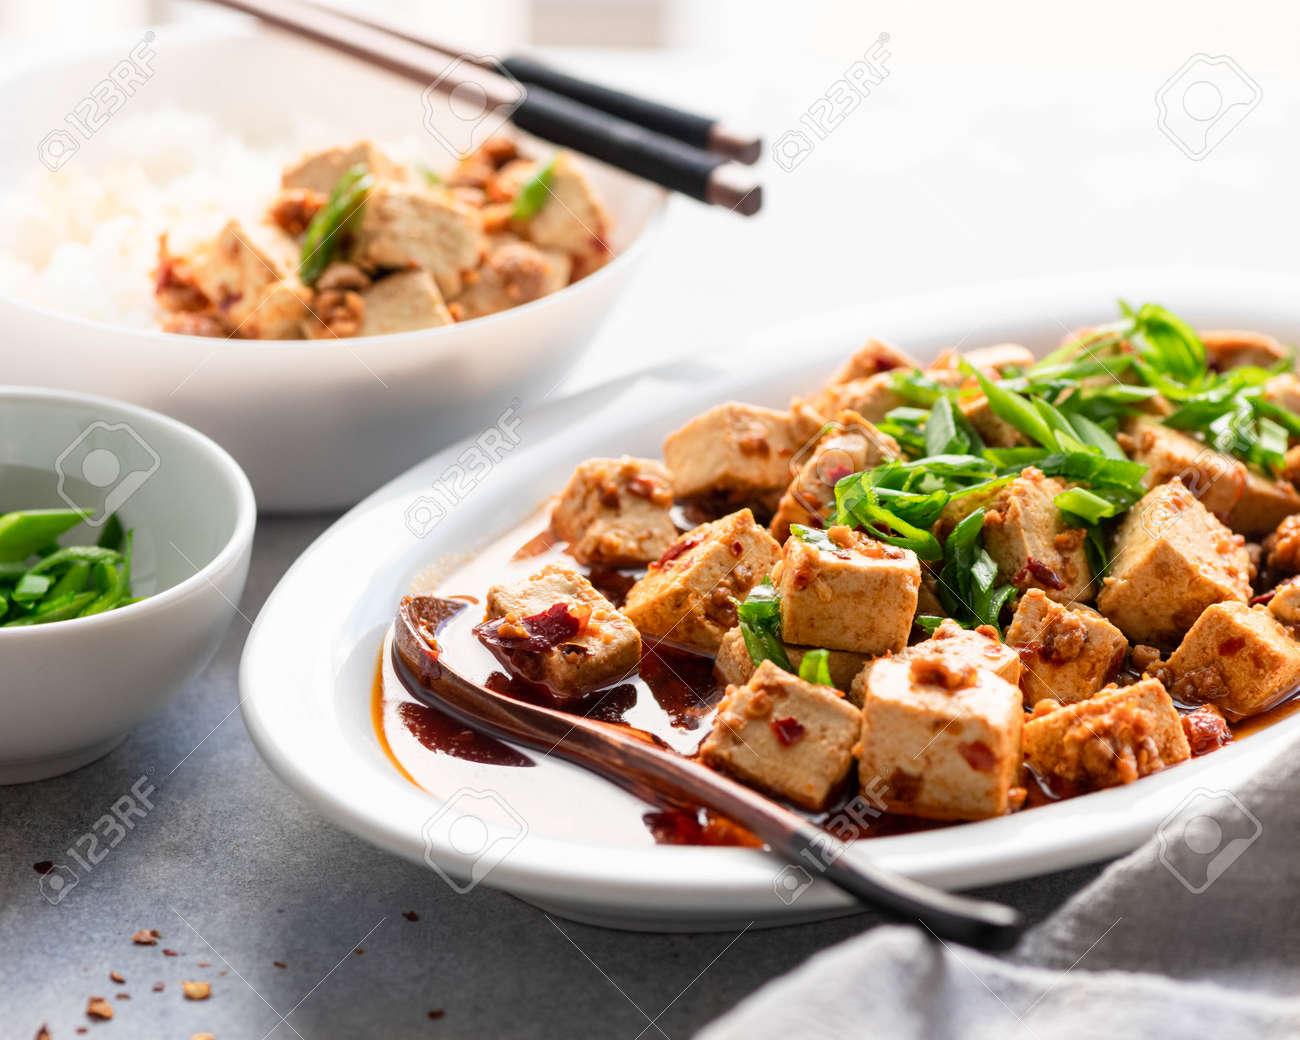 Chili Tofu, traditional chinese dish, selective focus - 169788494